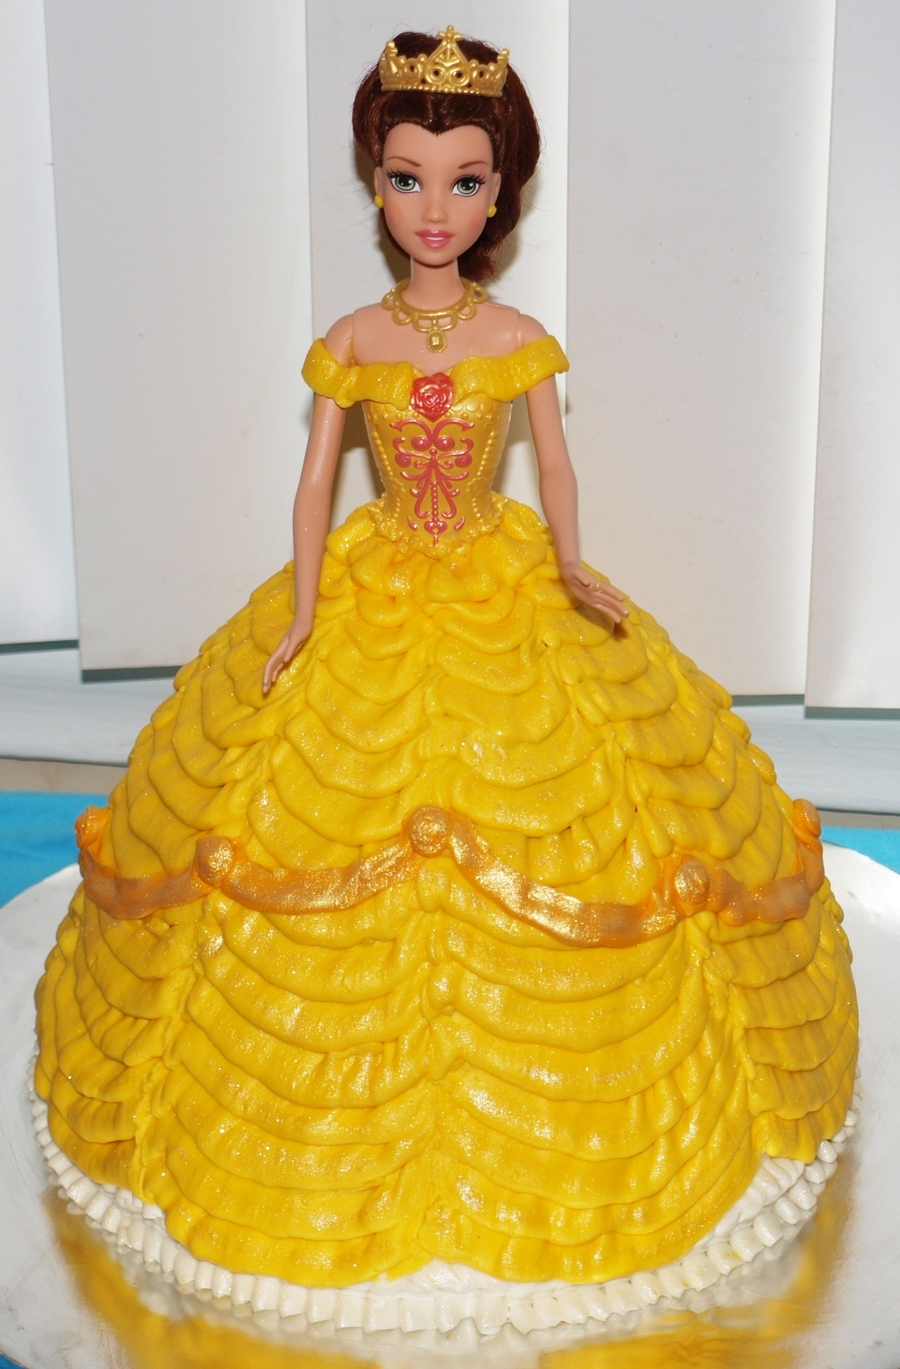 Rose Cake Design